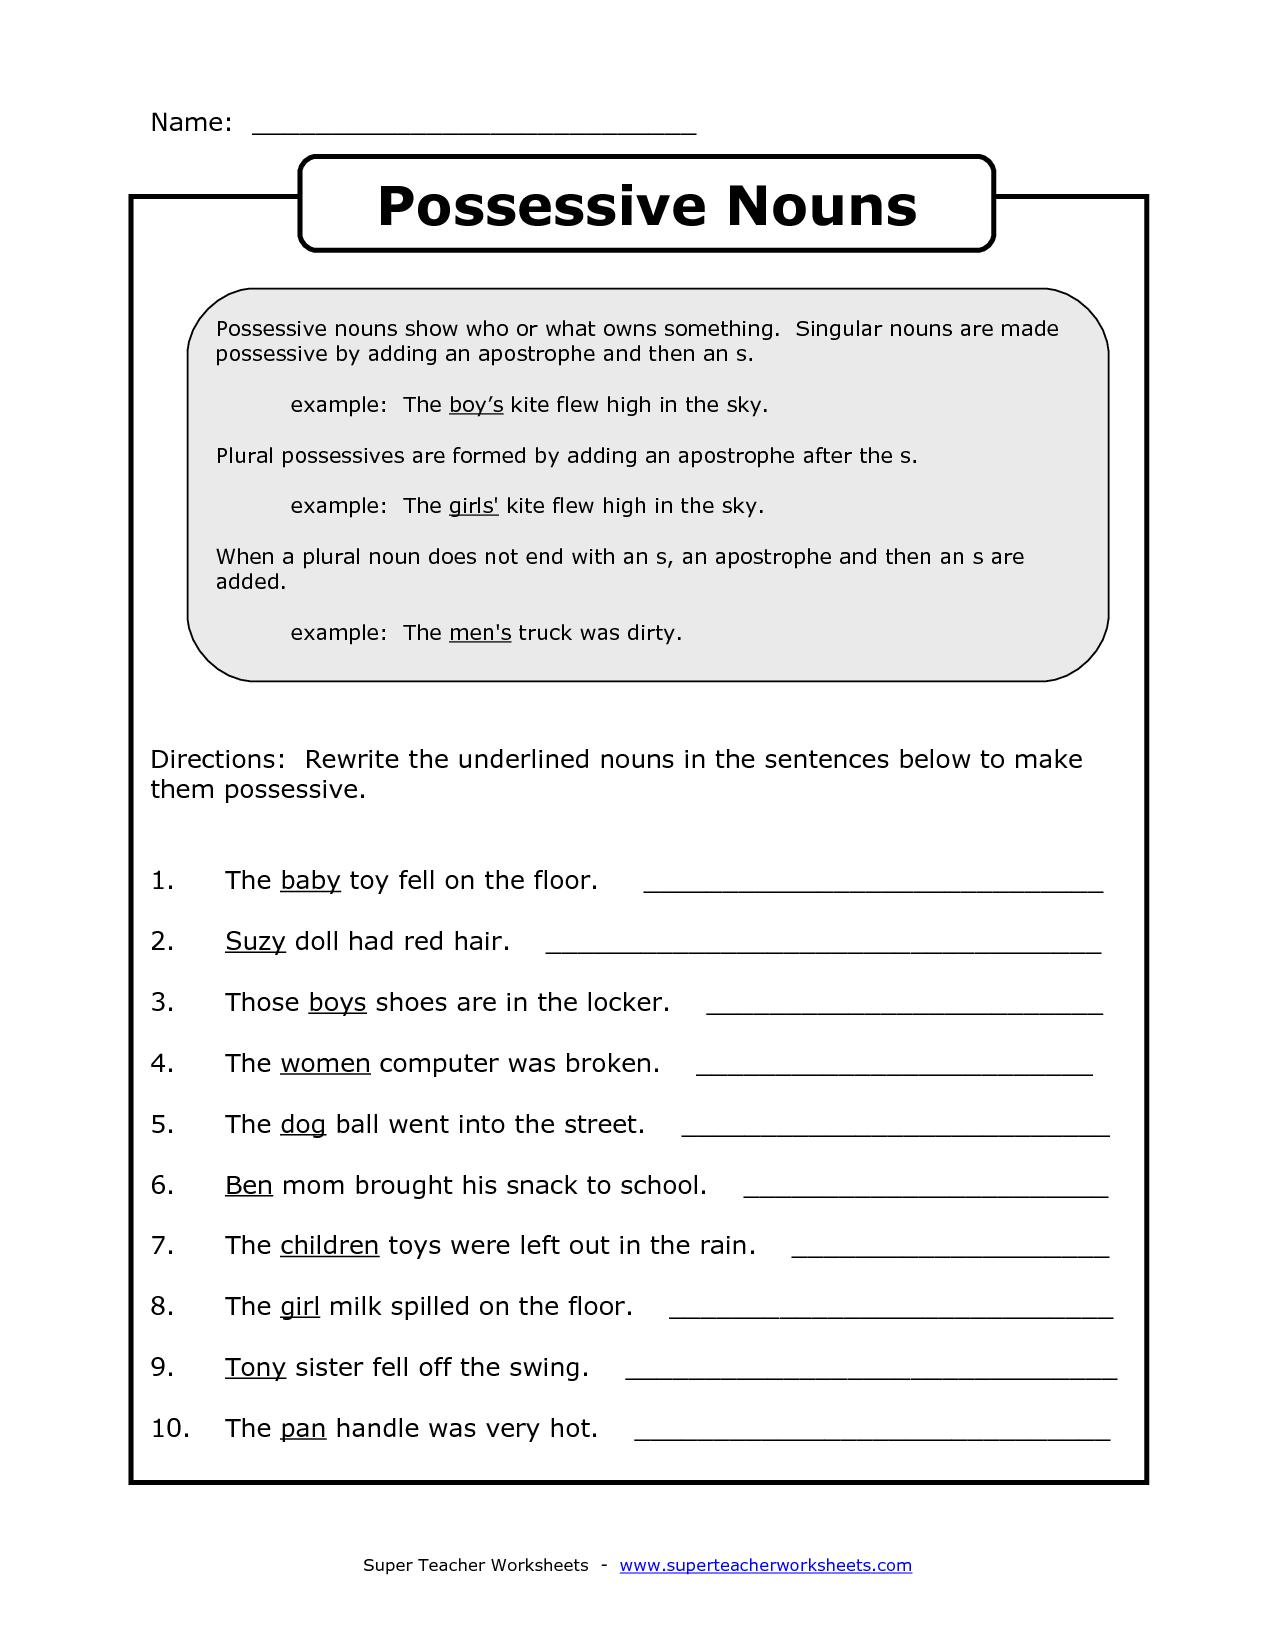 15 Best Images Of Possessive Nouns Worksheets 5th Grade